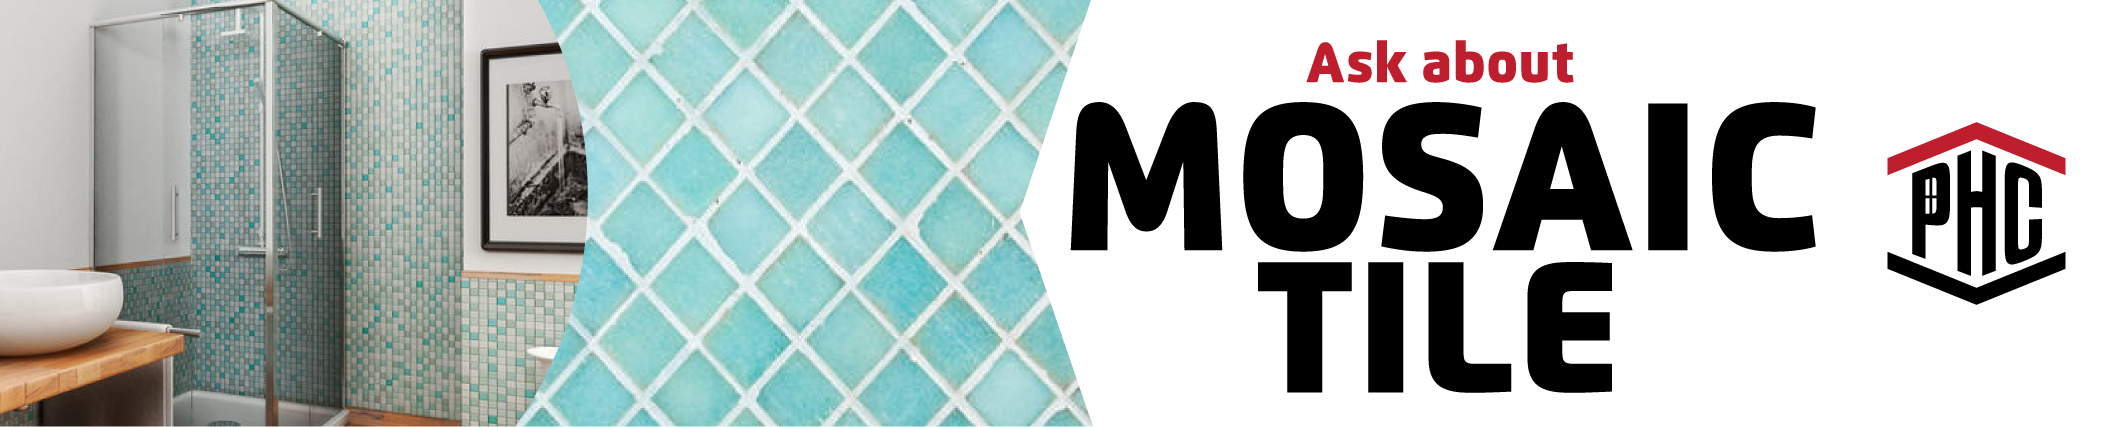 Mosaic Tile Company In Rio Rancho